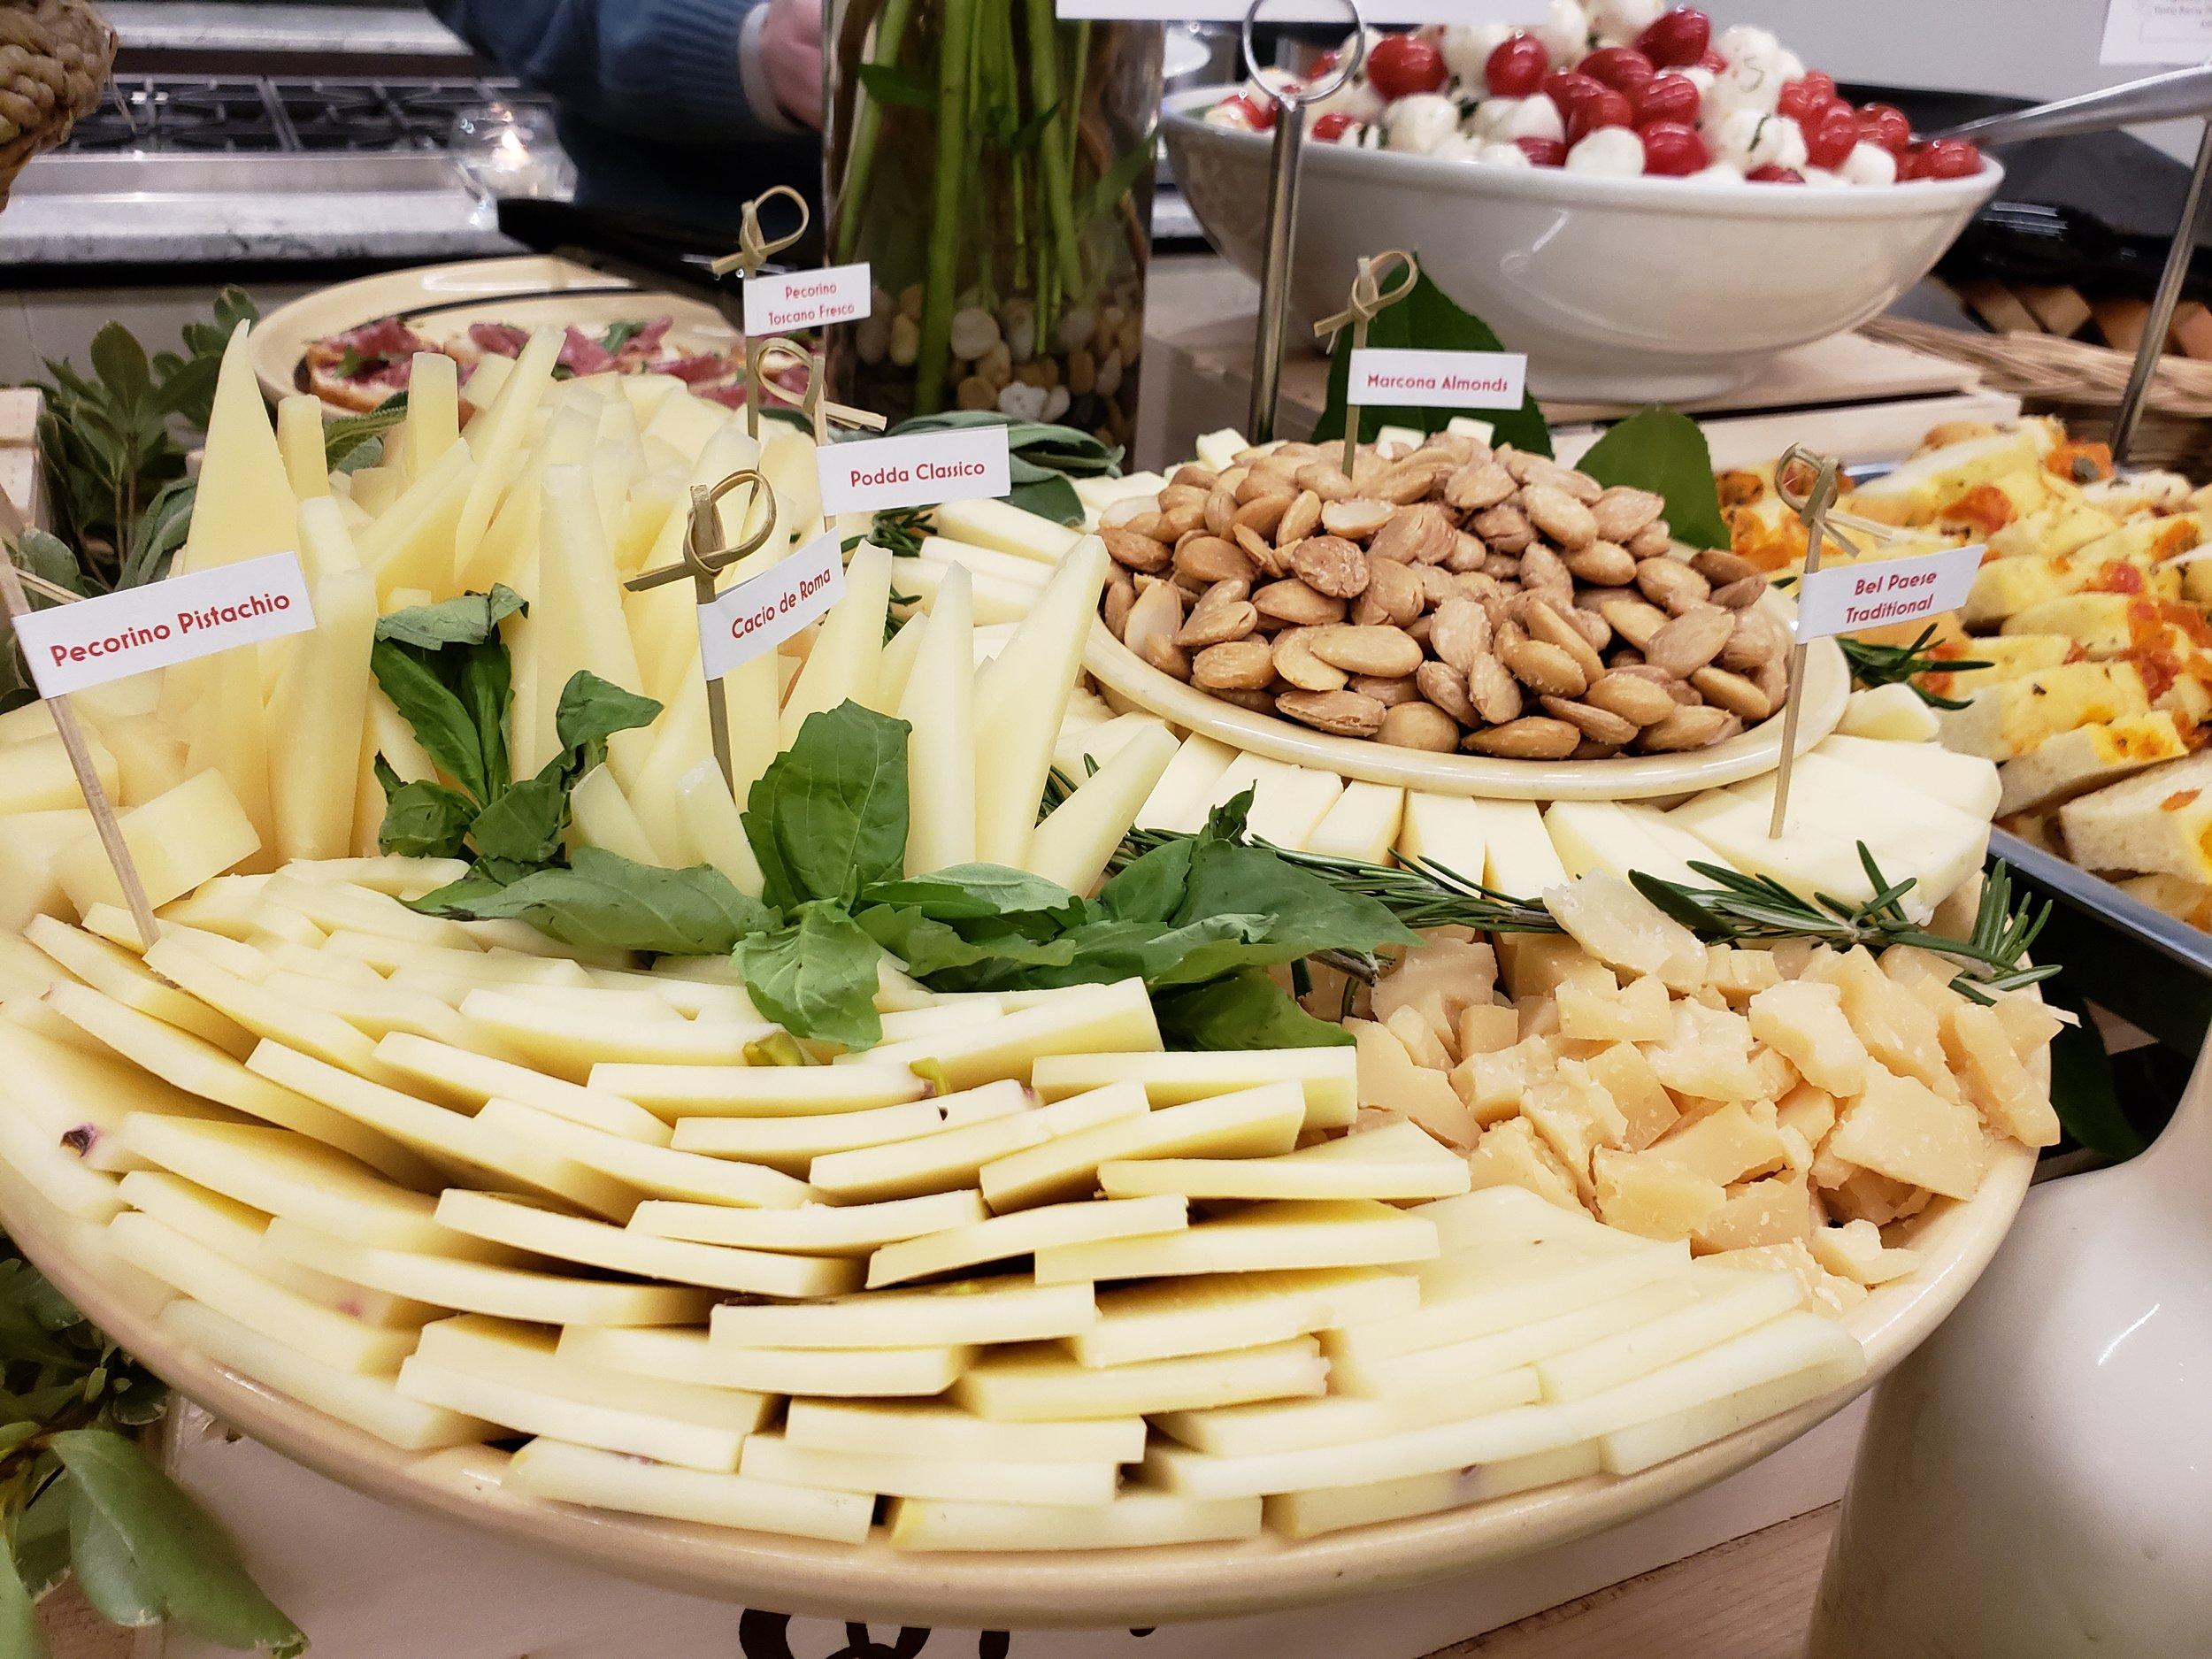 Cheese, Cheese, Cheese!